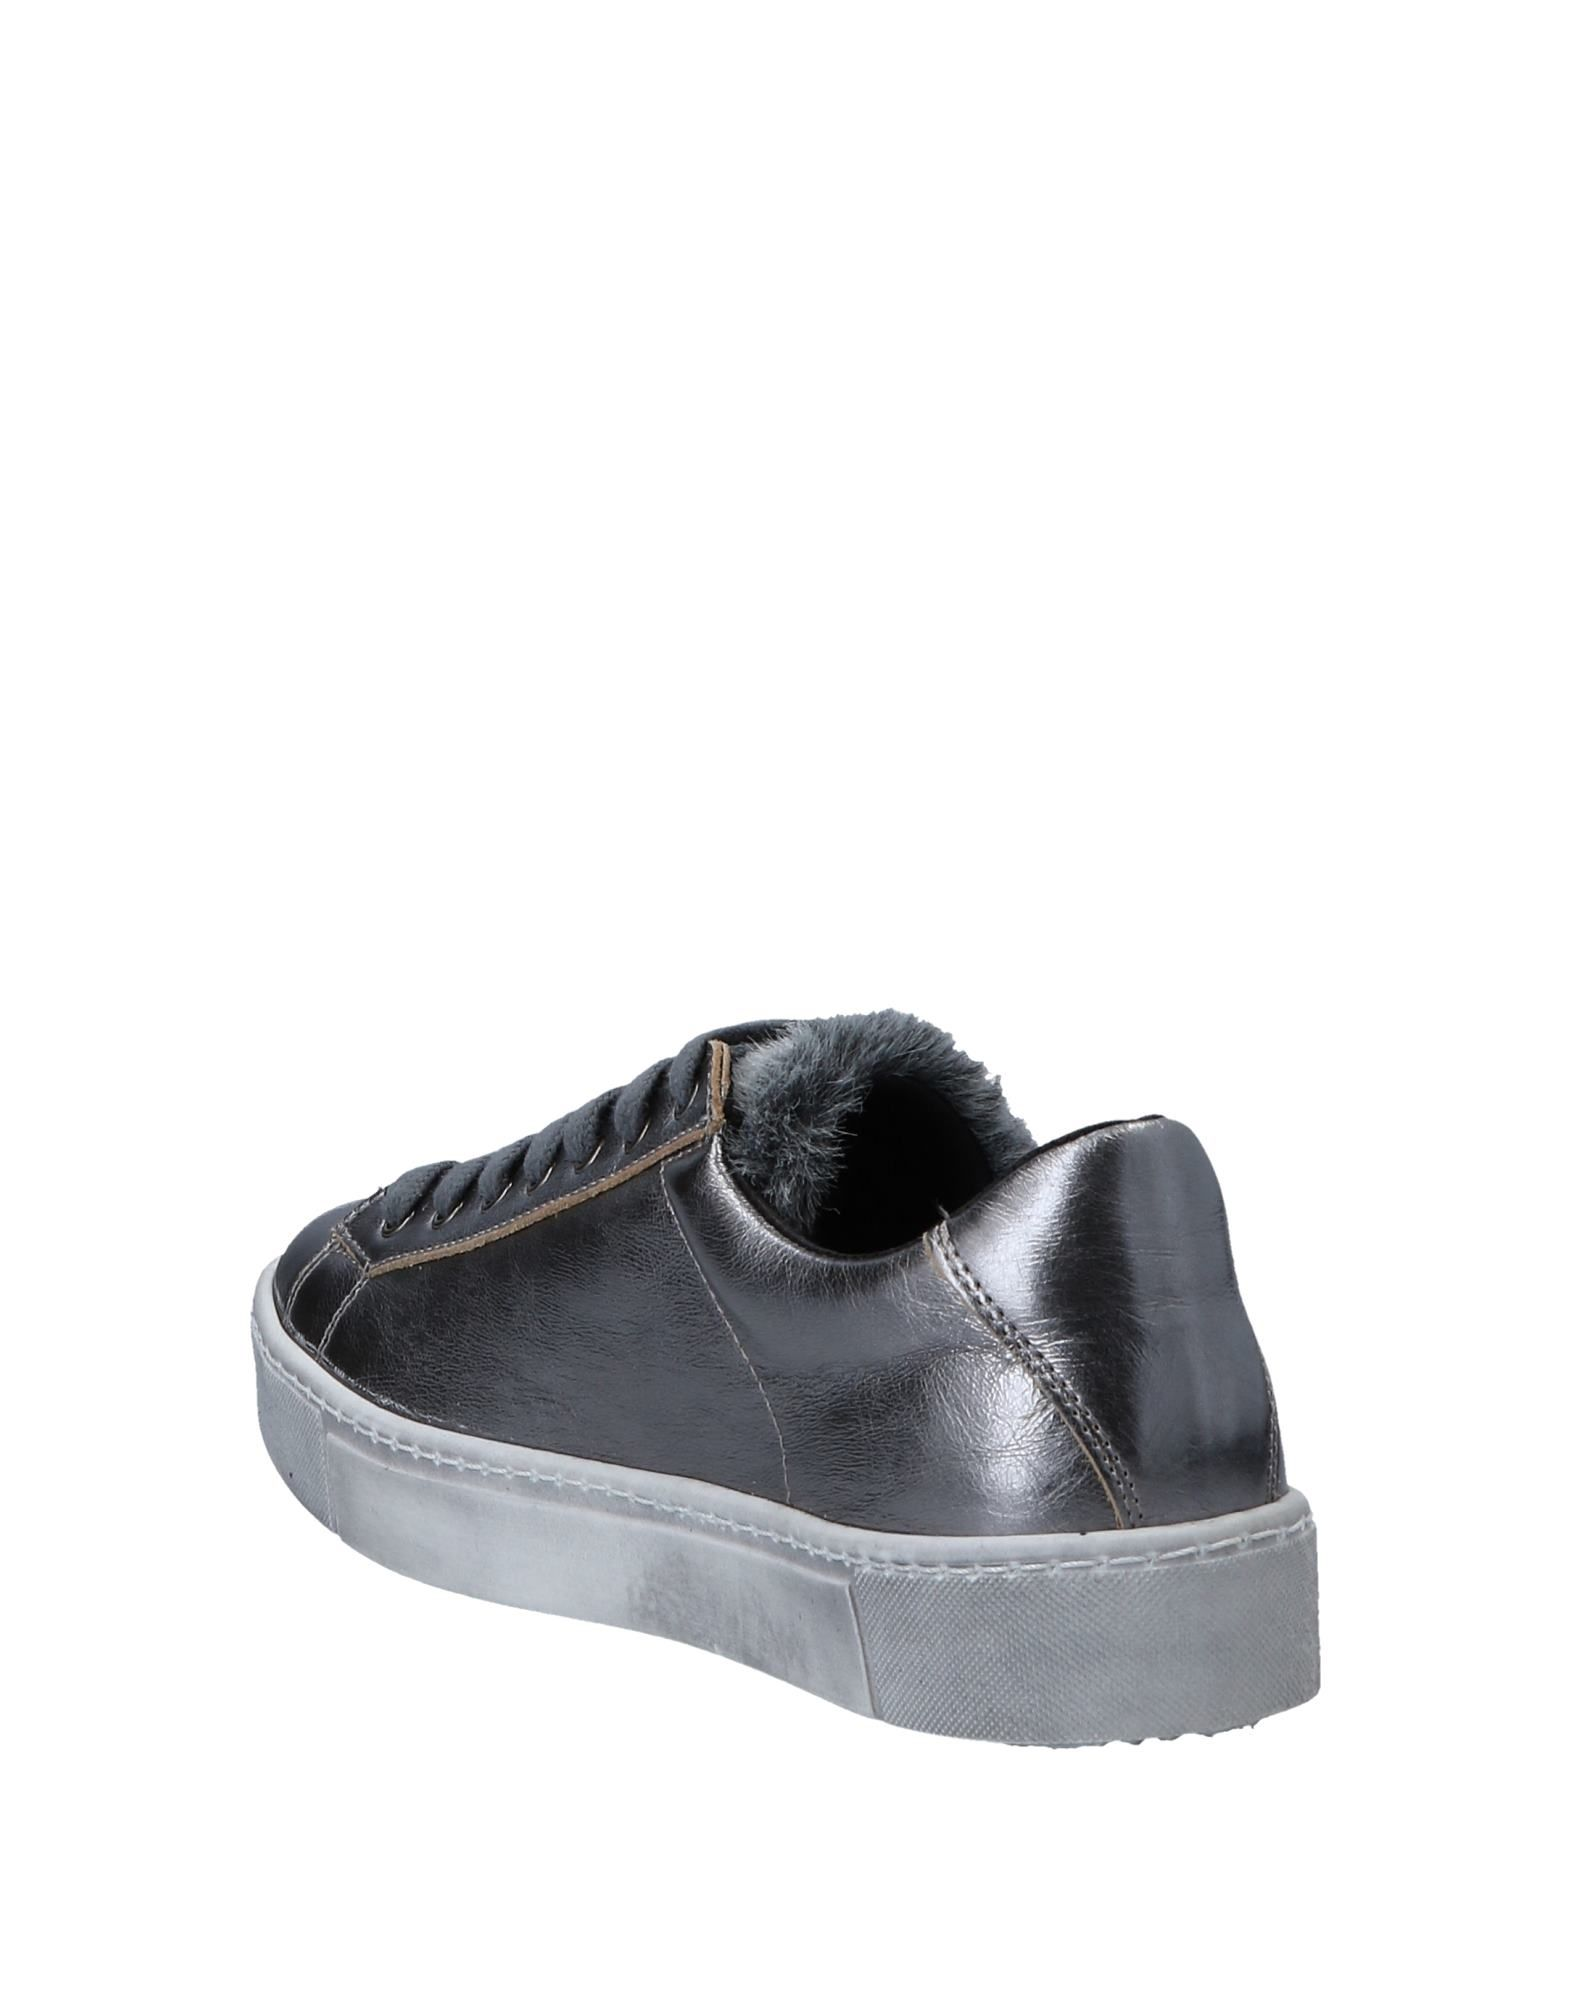 Gut um billige Schuhe  zu tragenManuela Dardozzi Sneakers Damen  Schuhe 11558296DQ 408476